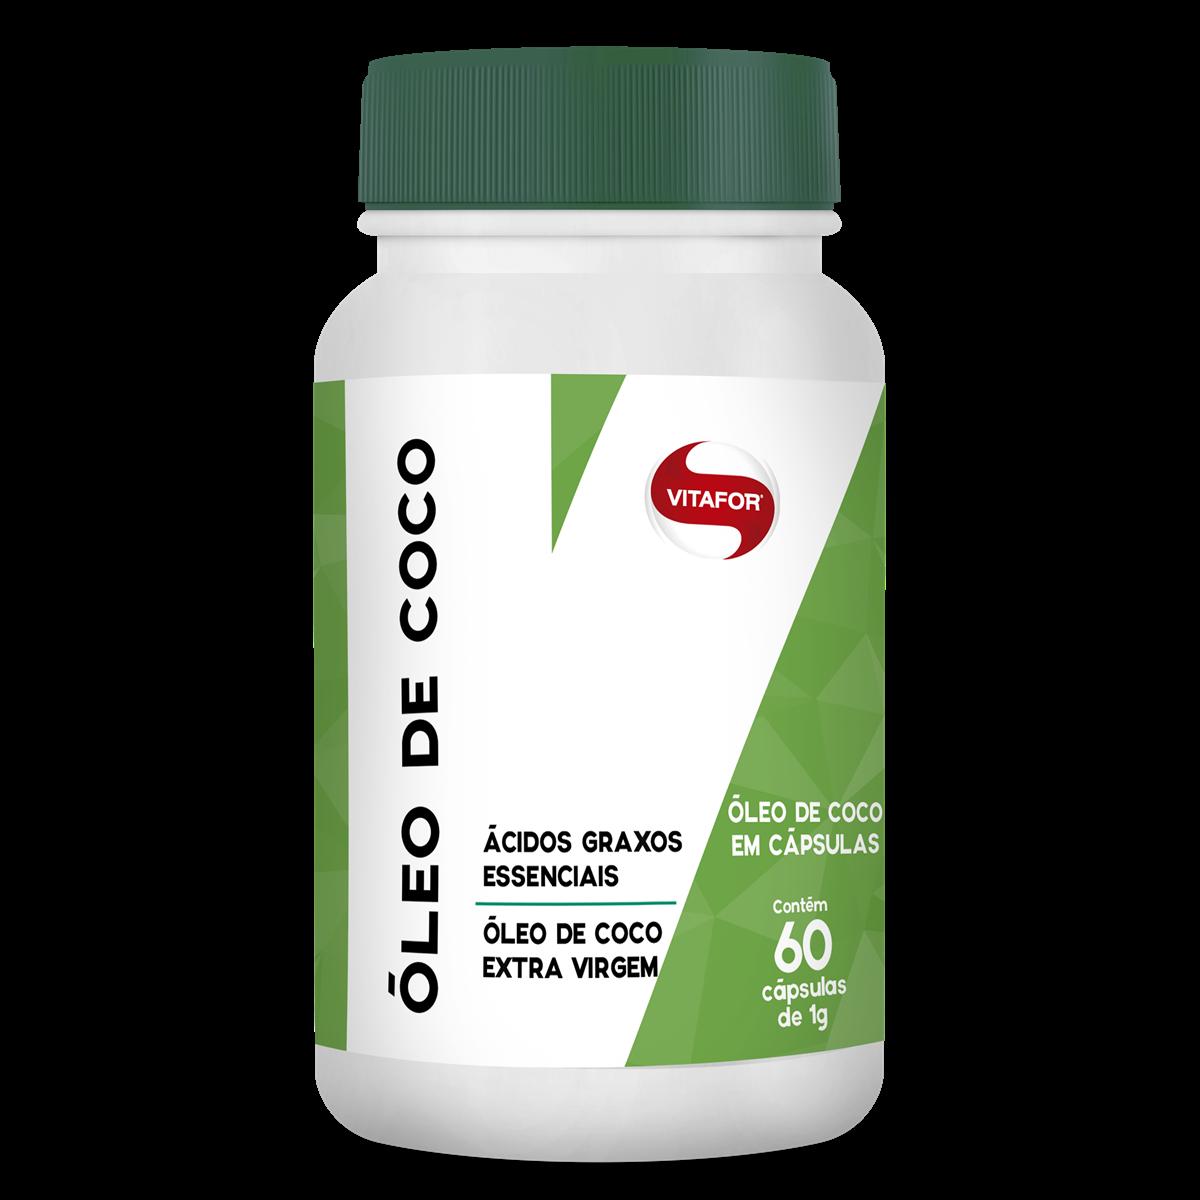 OLEO DE COCO 60 CAPS - VITAFOR